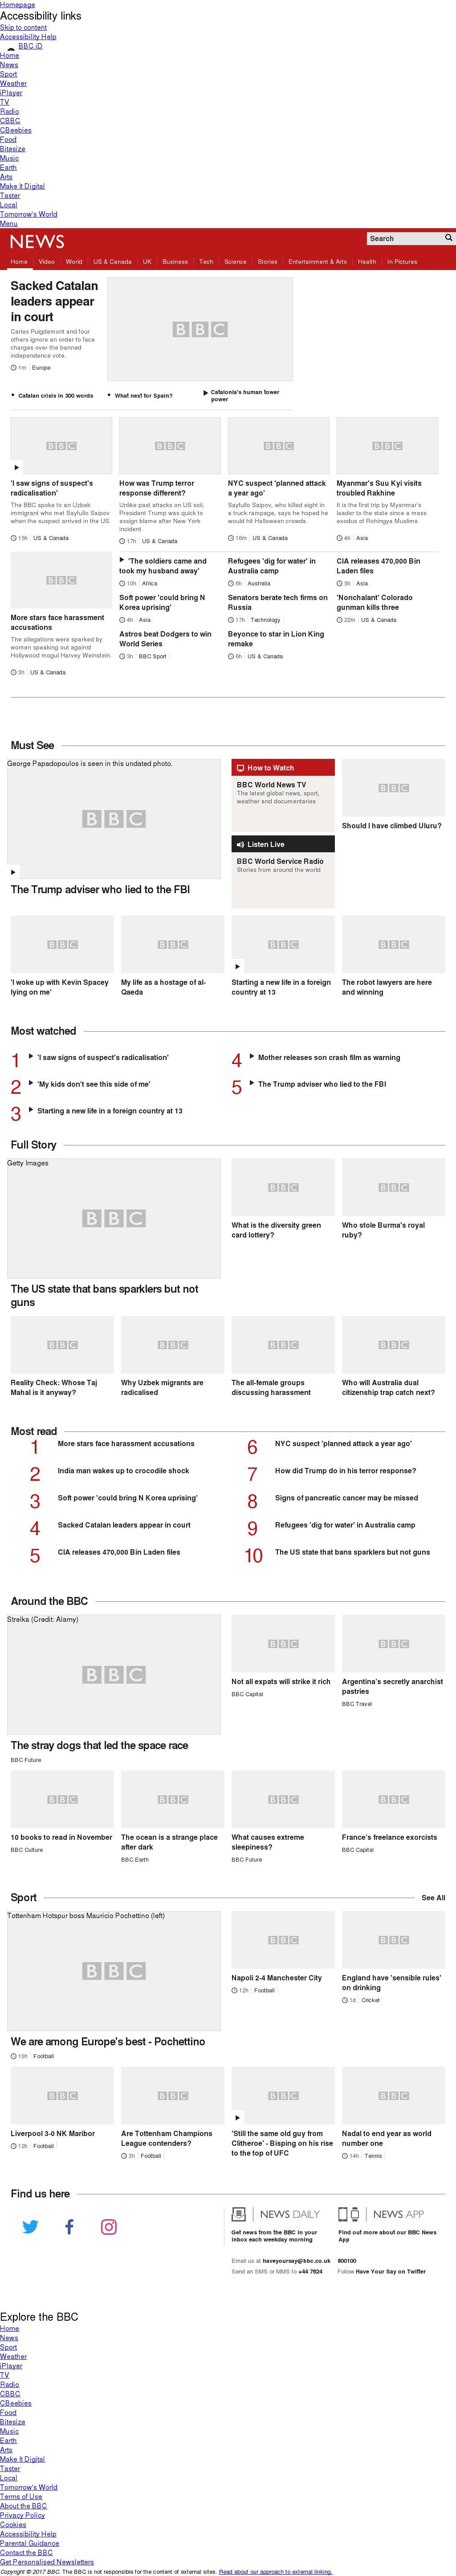 BBC at Thursday Nov. 2, 2017, 10 a.m. UTC